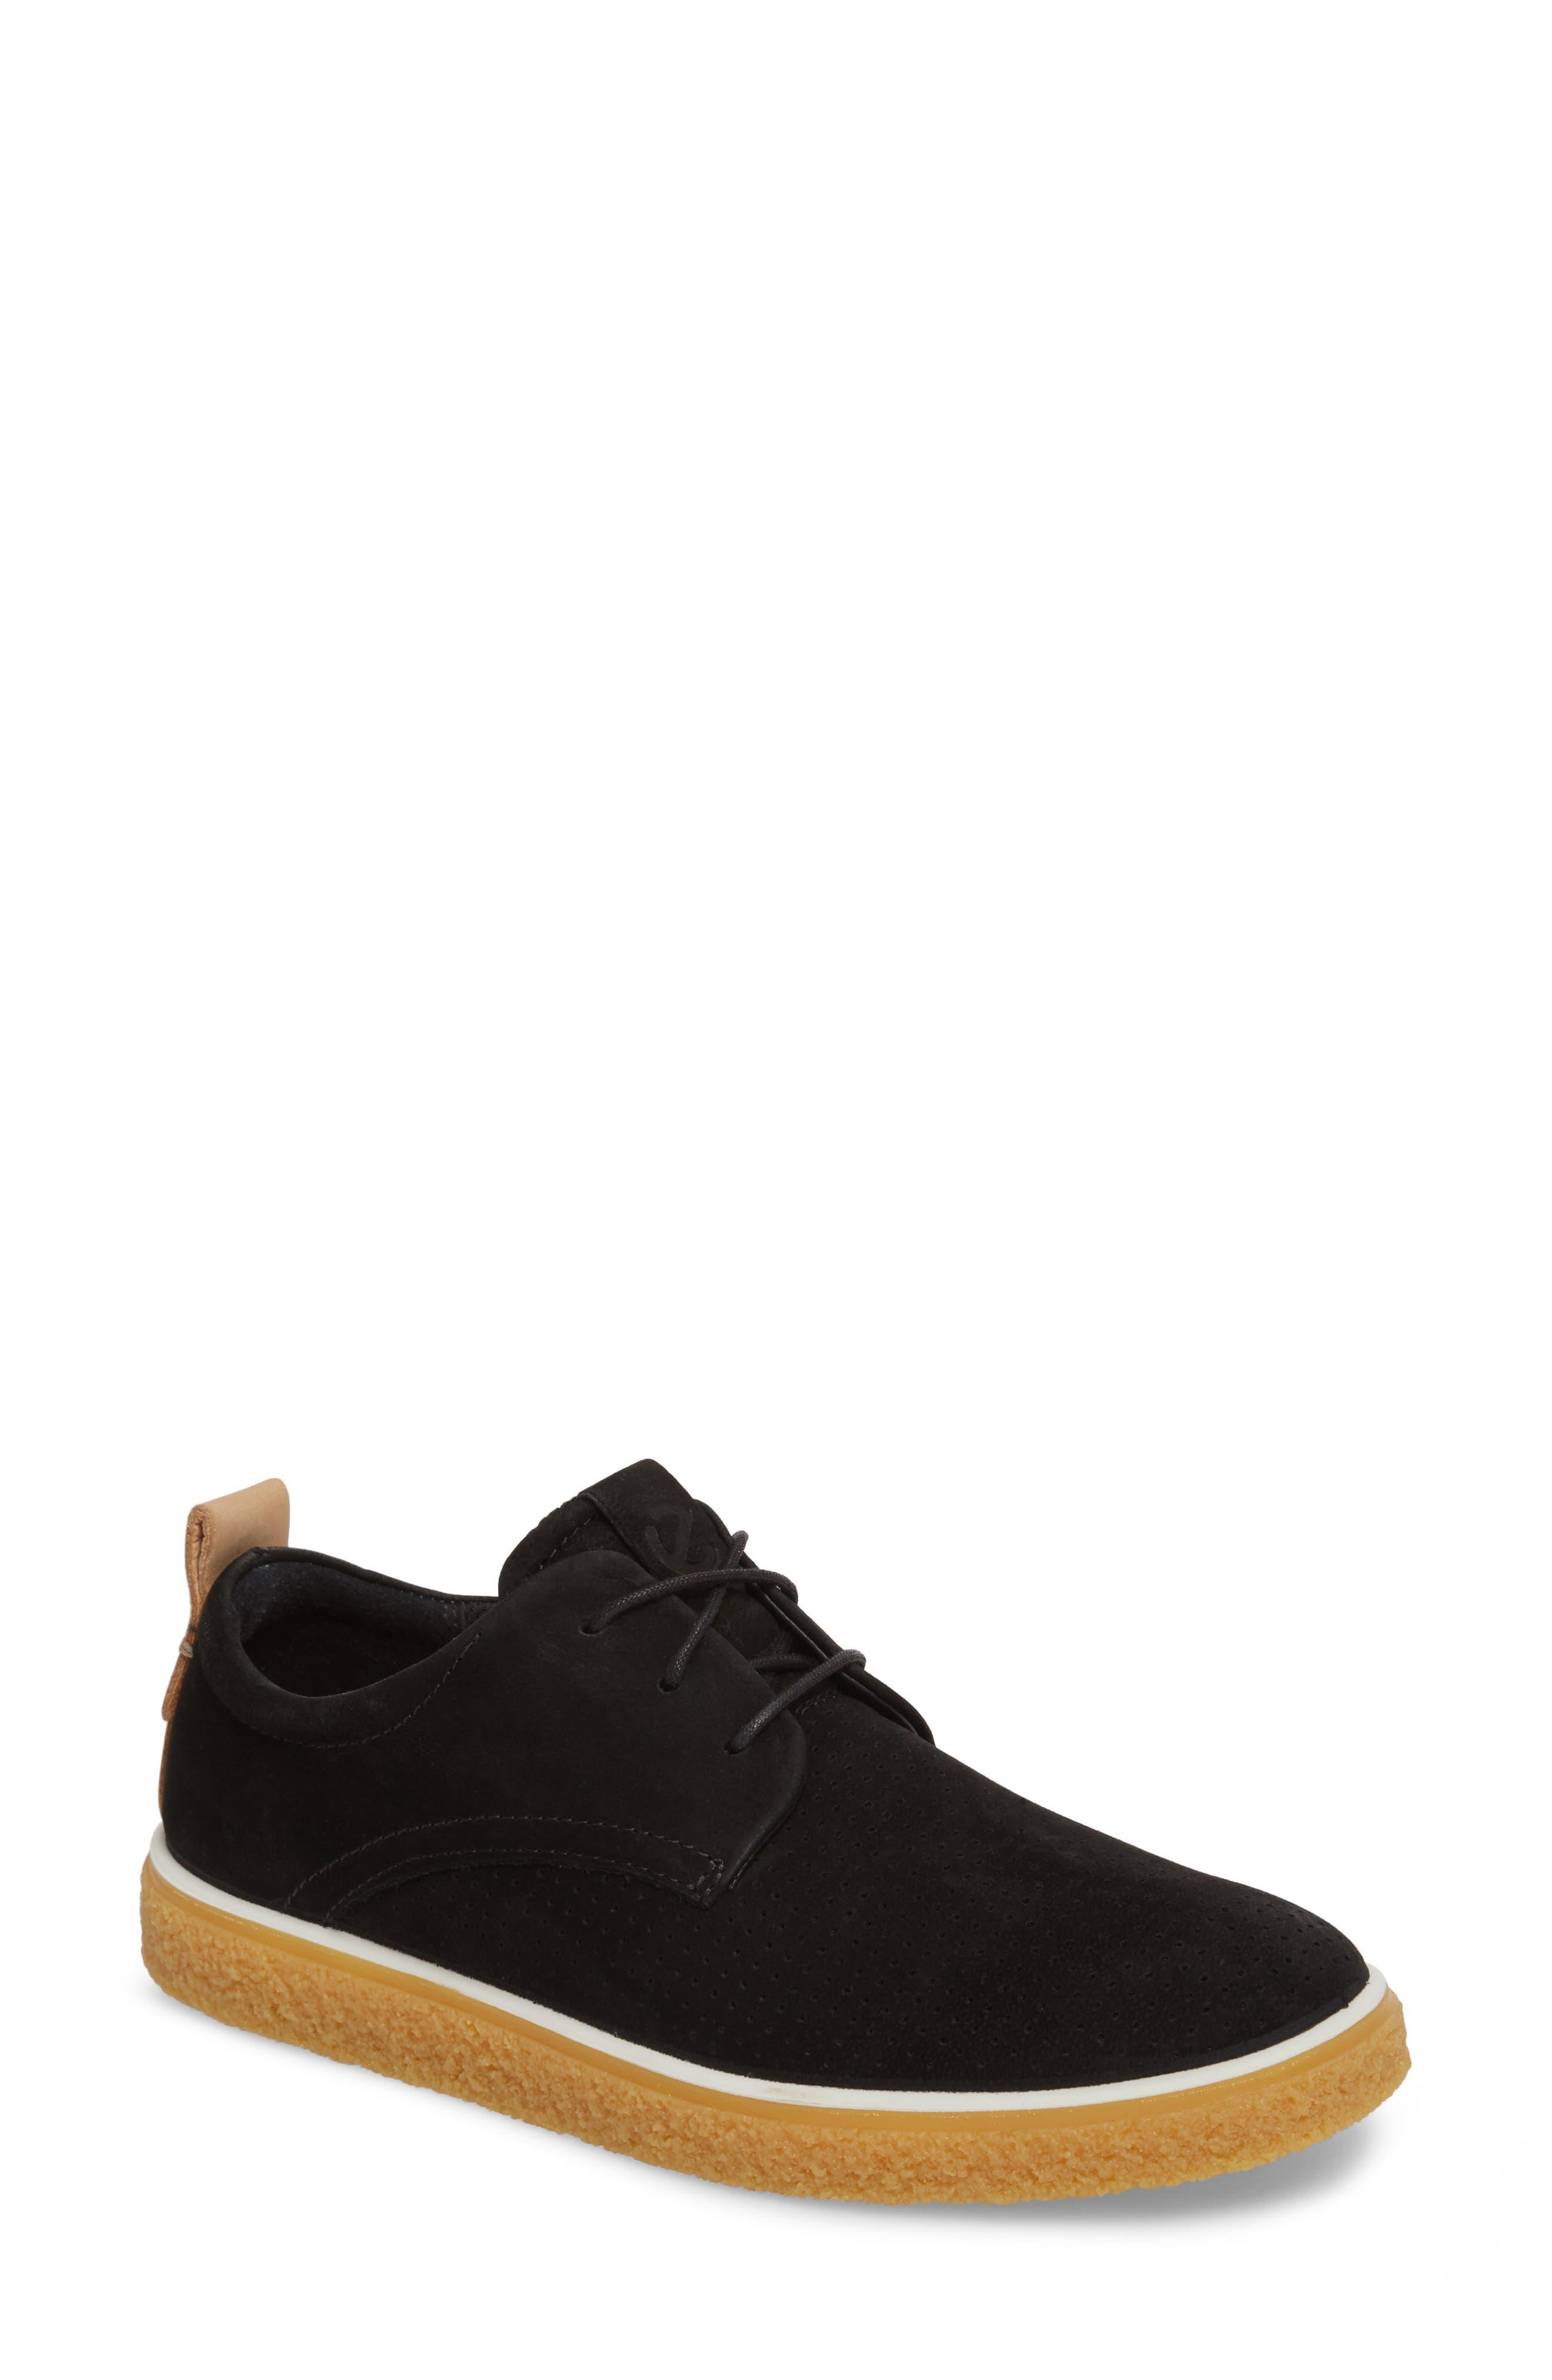 Crepetray Sneaker,                         Main,                         color, 009